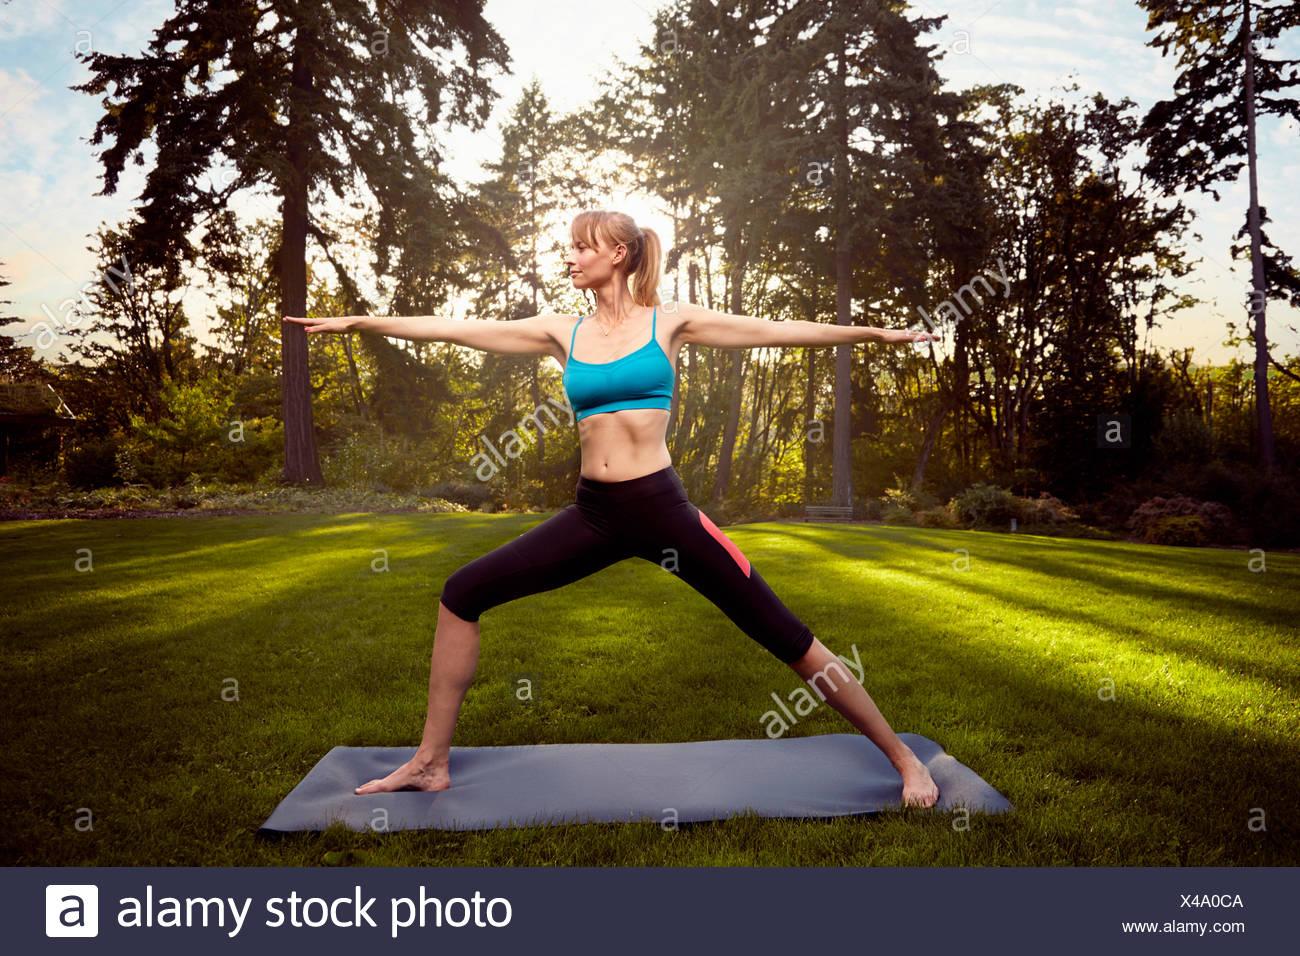 dc219394df Mid adult woman practicing warrior pose dans park Photo Stock